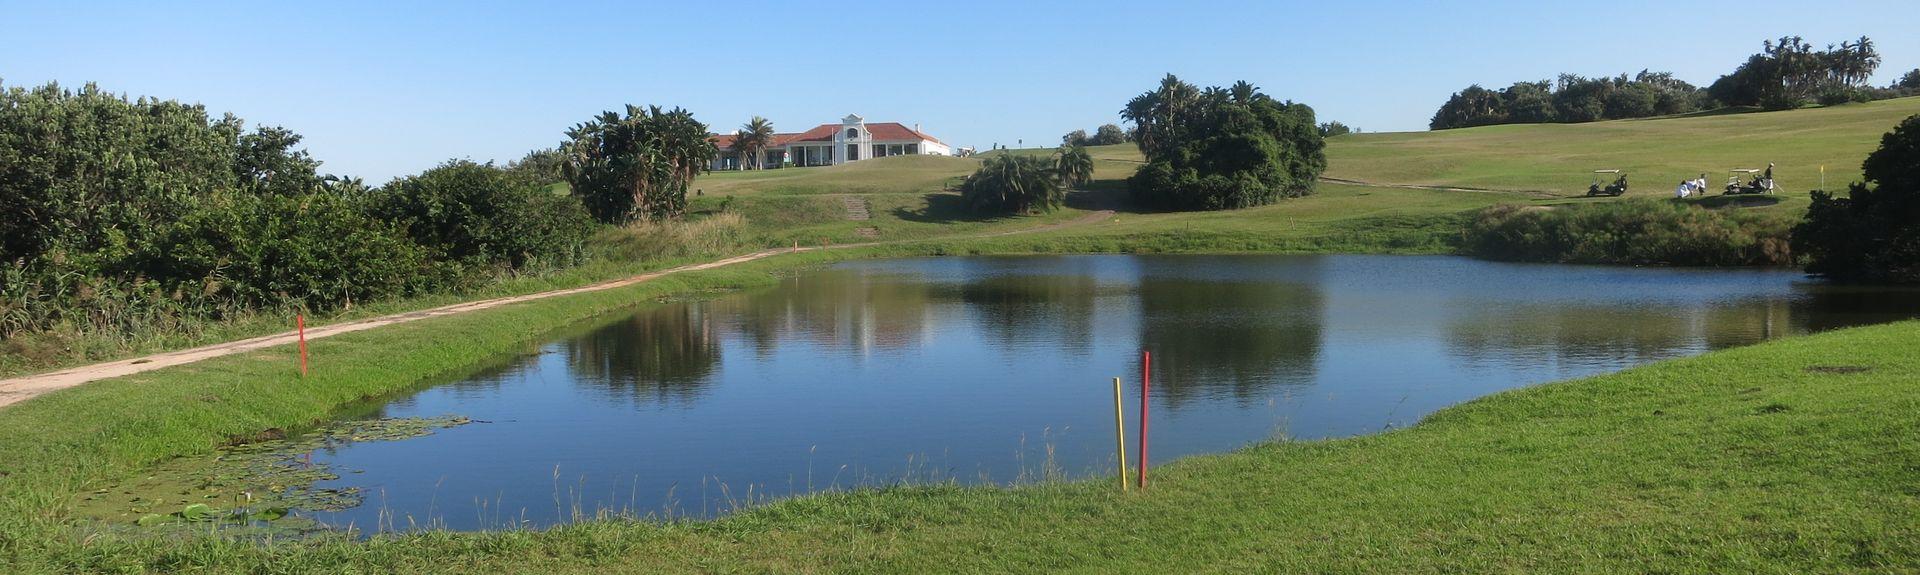 Hibiscus Coast Municipality, South Africa